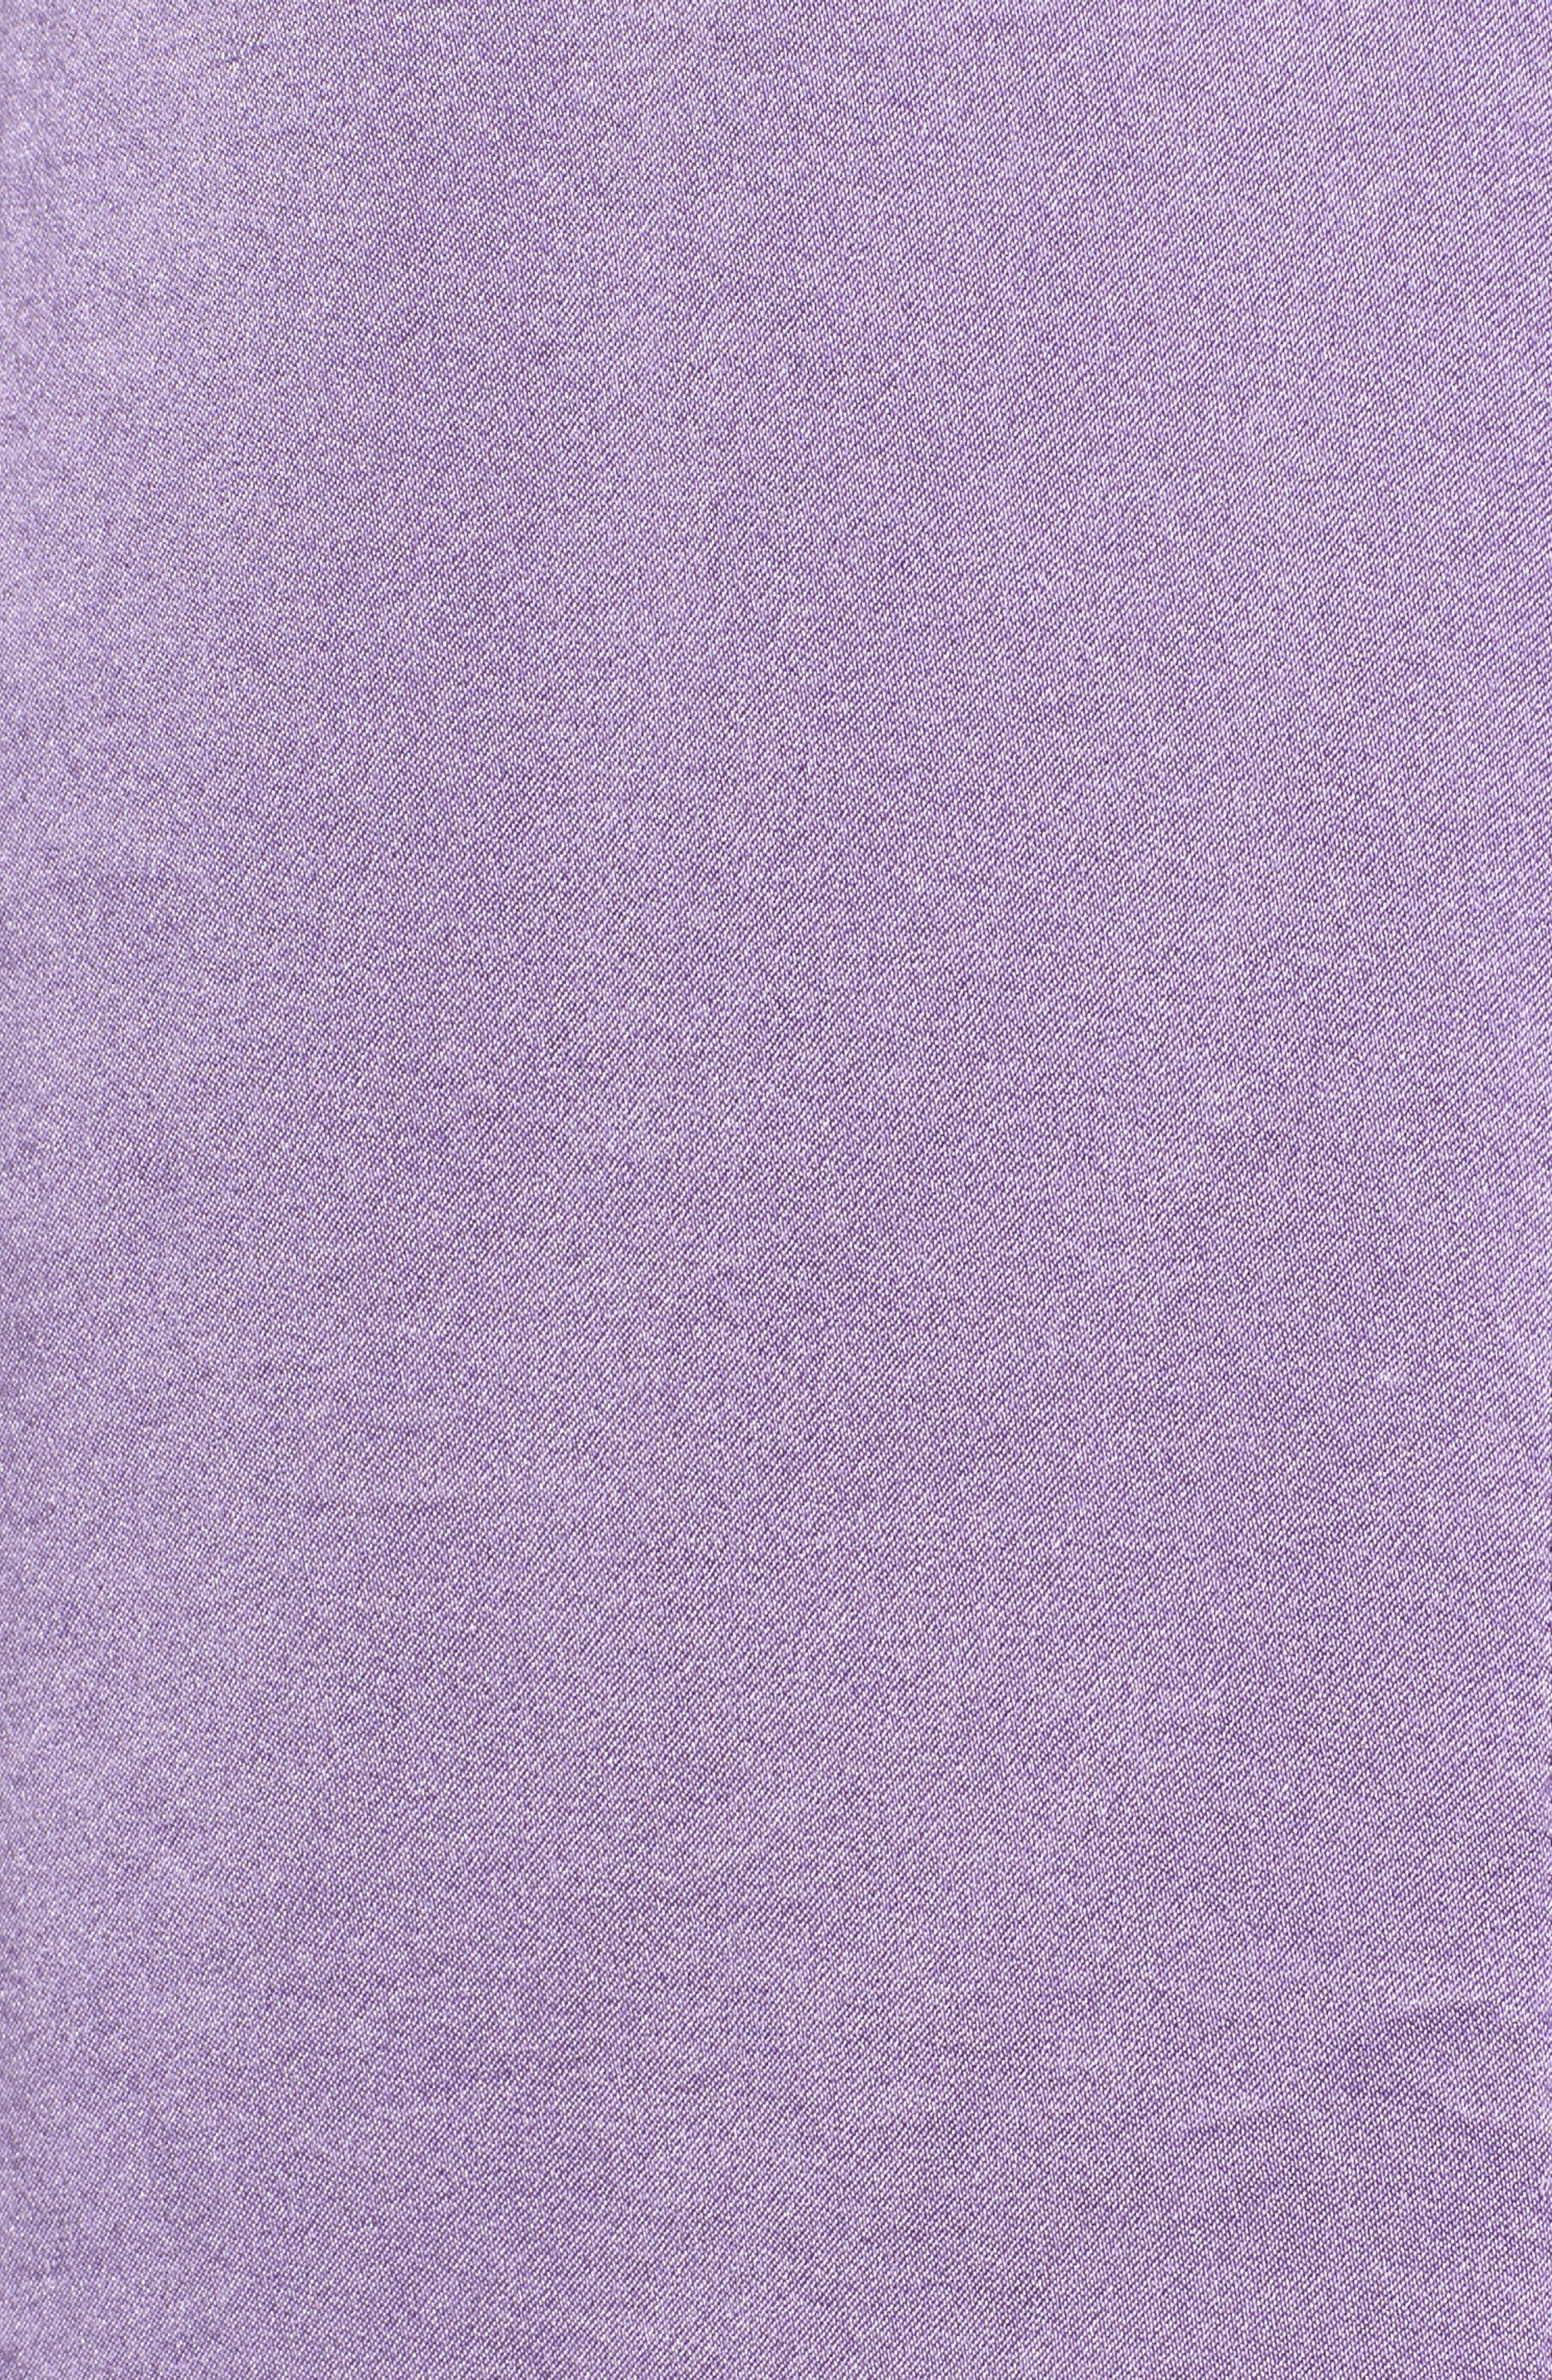 Cora Silk Blouse,                             Alternate thumbnail 5, color,                             LILAC